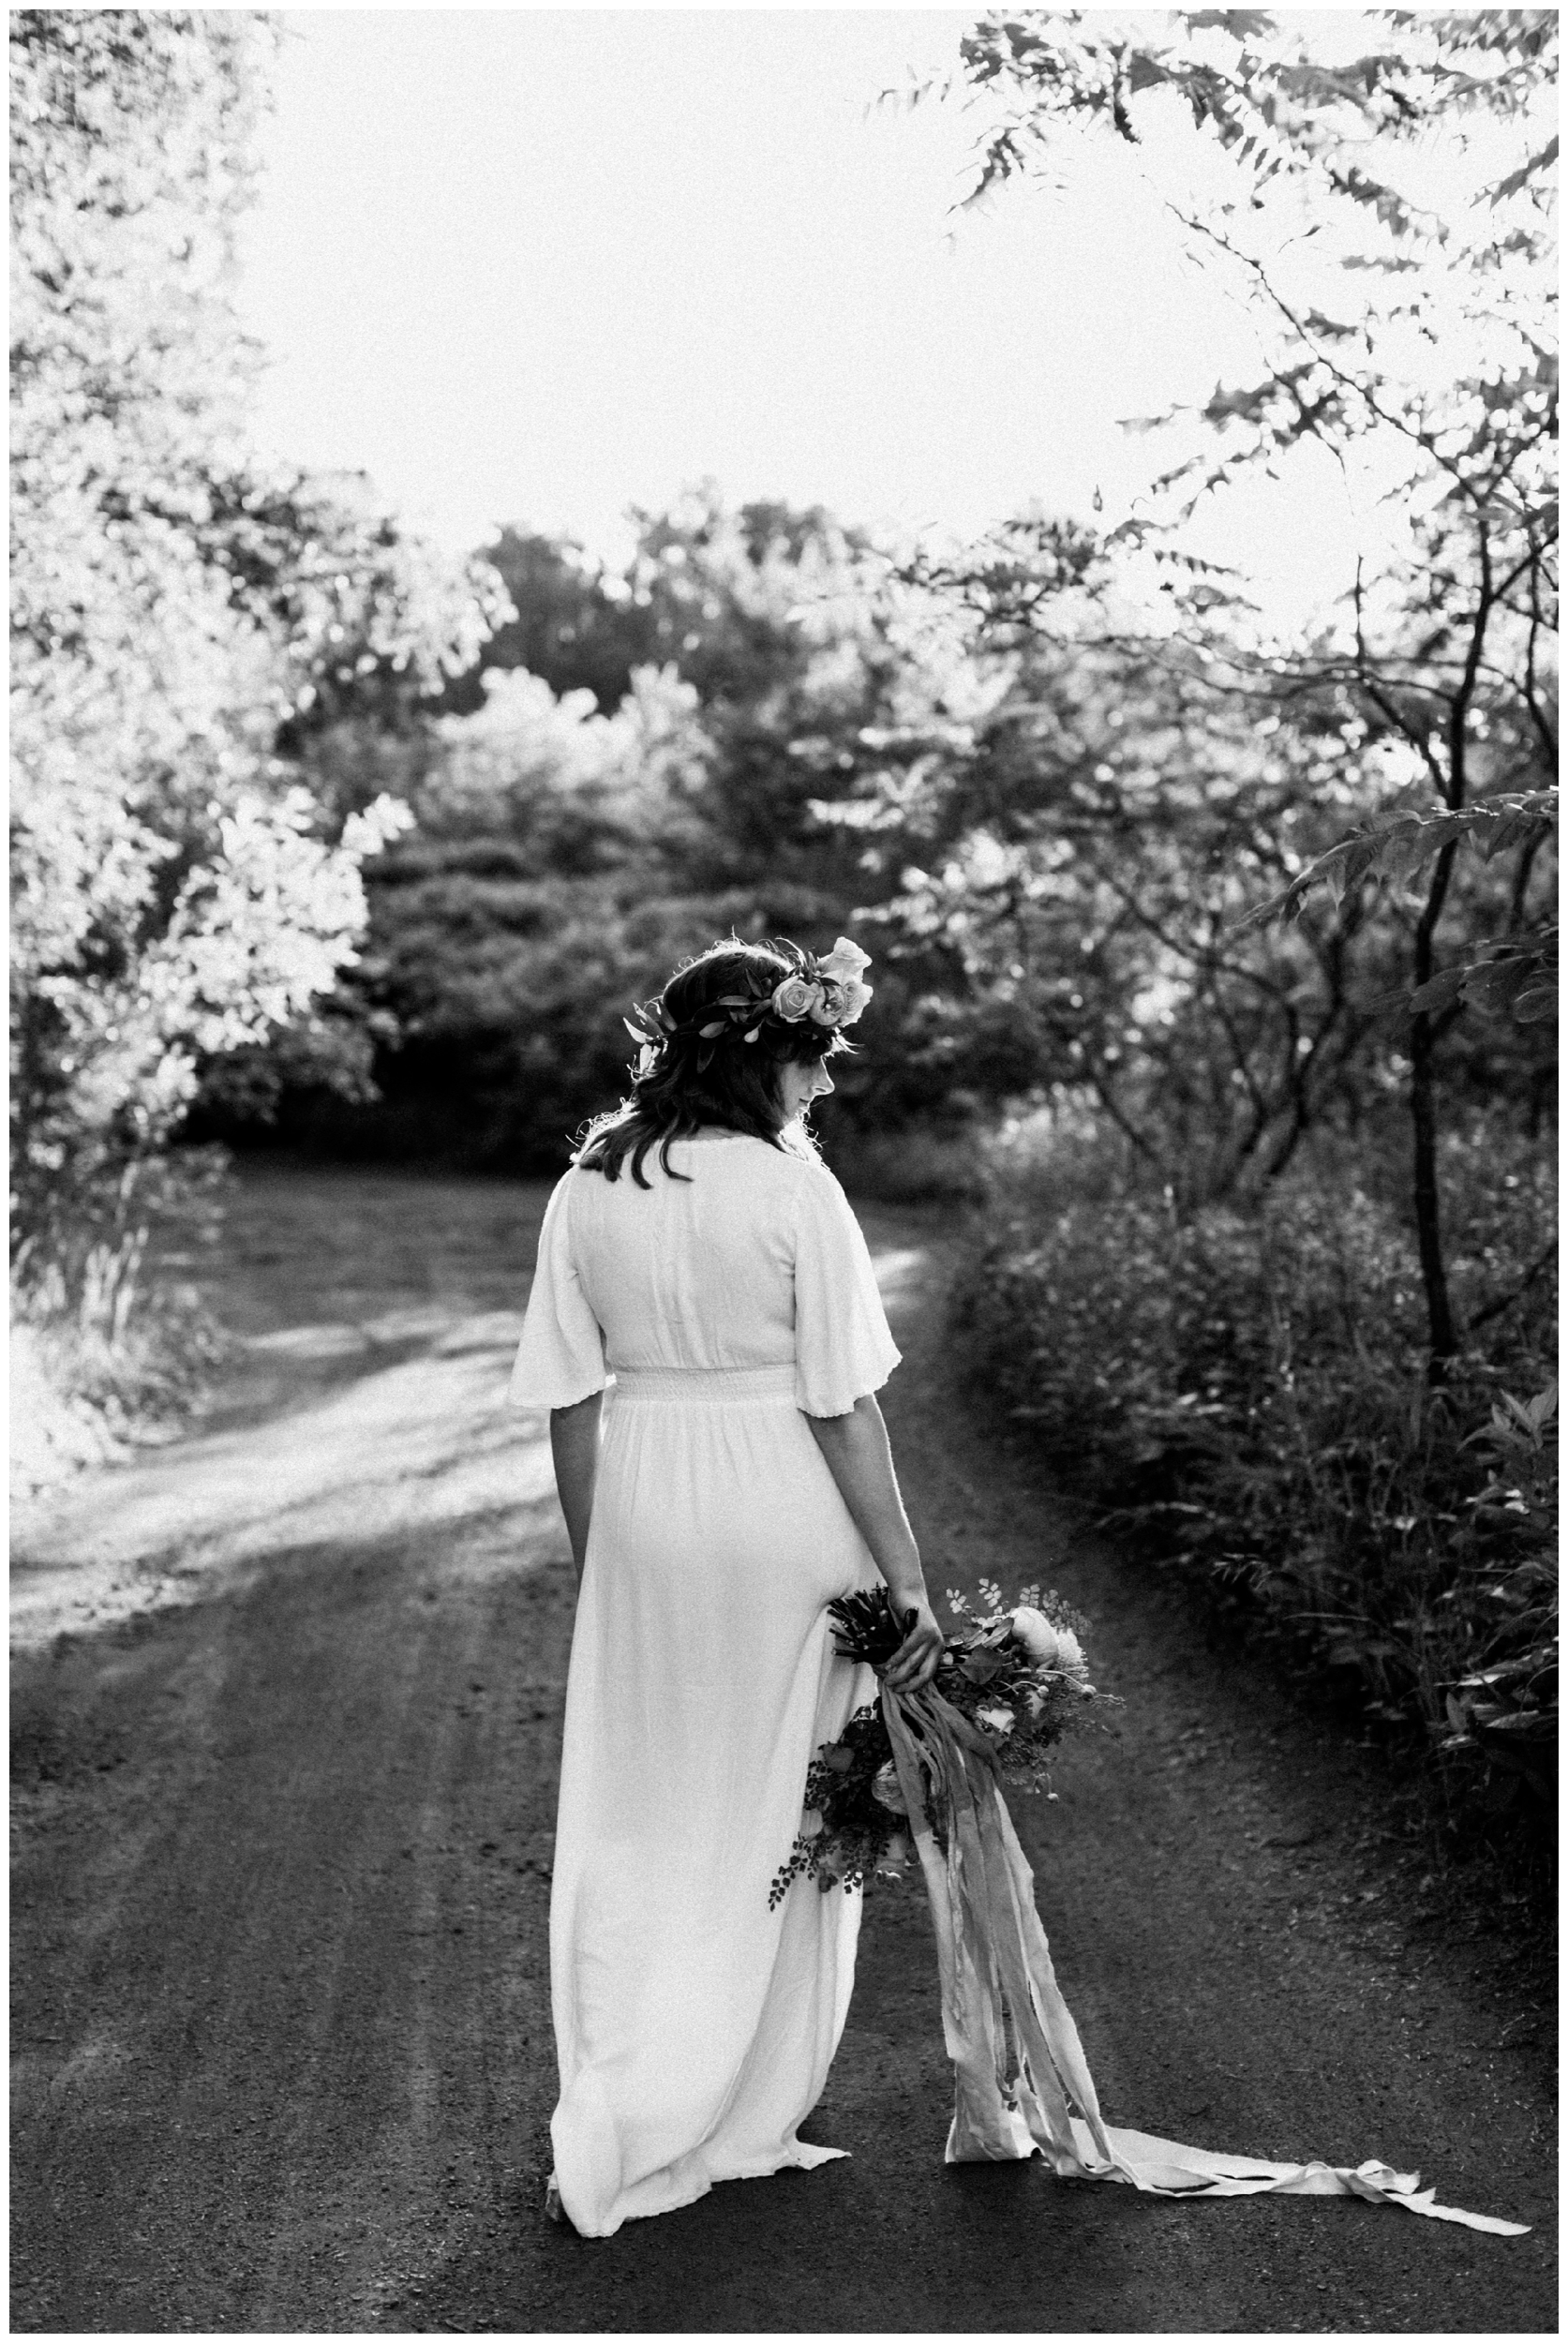 Romantic, boho bridal portrait by Brainerd Minnesota wedding photographer Britt DeZeeuw